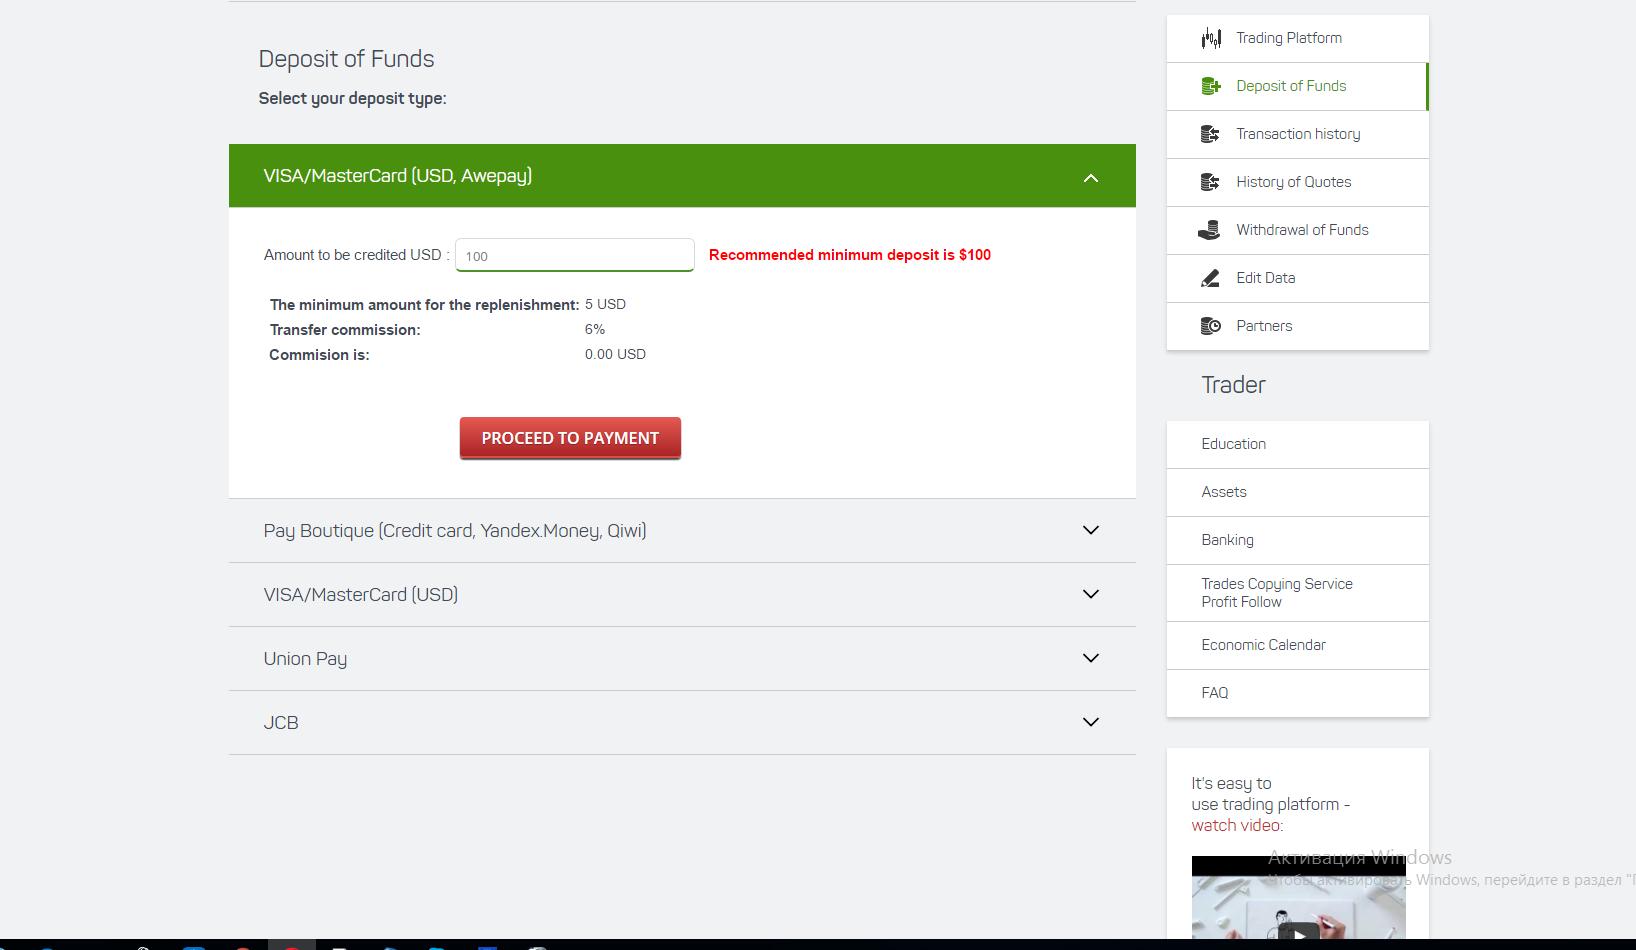 Verum Option Deposit Page